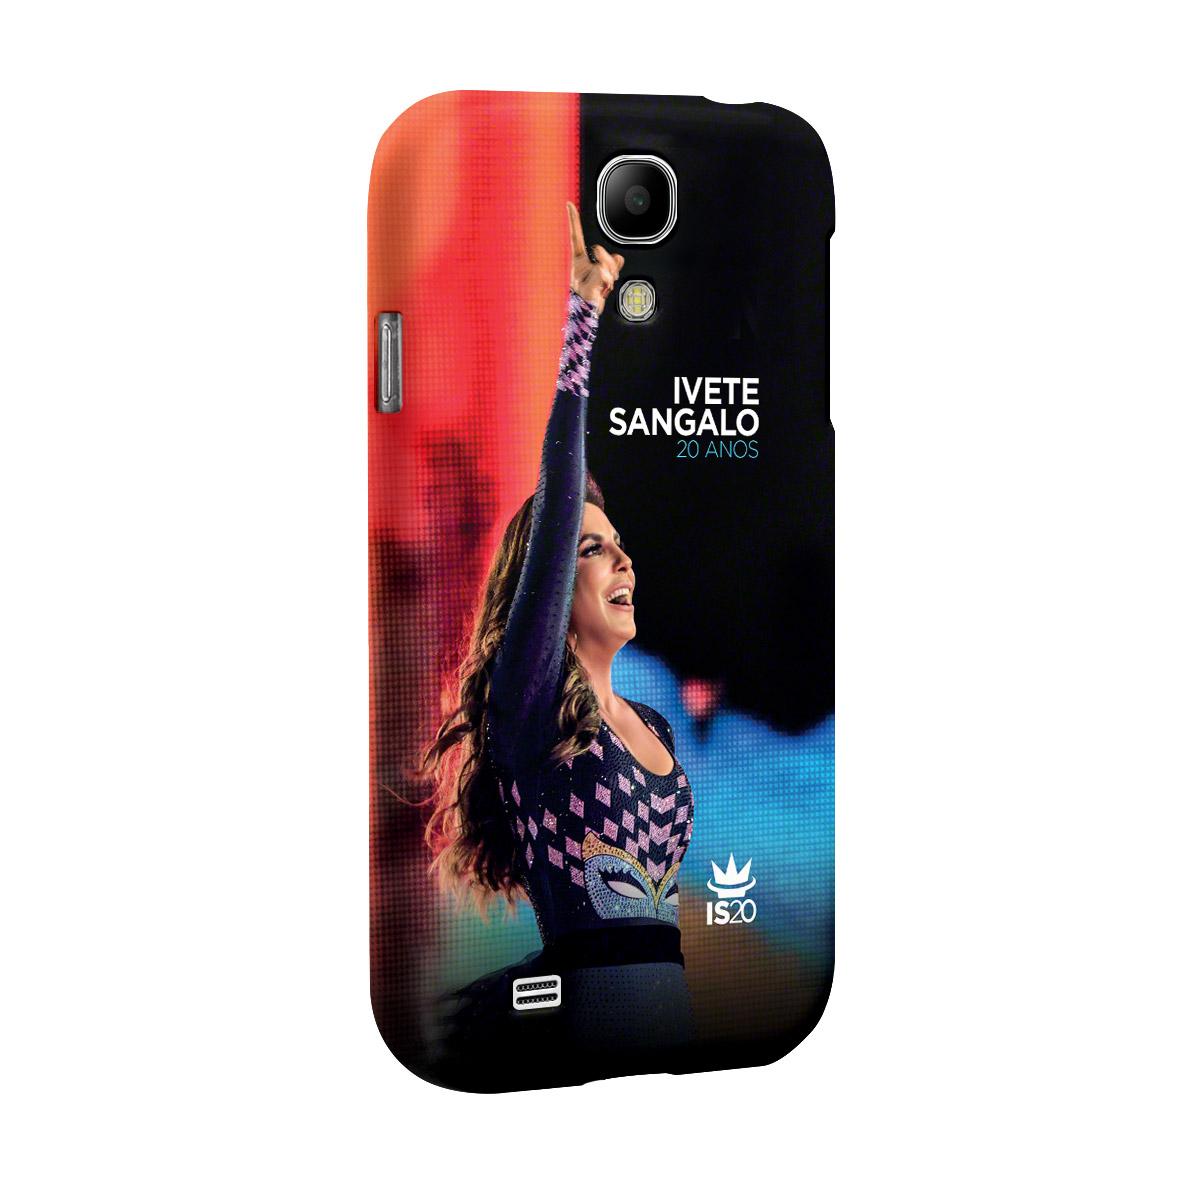 Capa de Celular Samsung Galaxy S4 Ivete Sangalo Capa 20 Anos